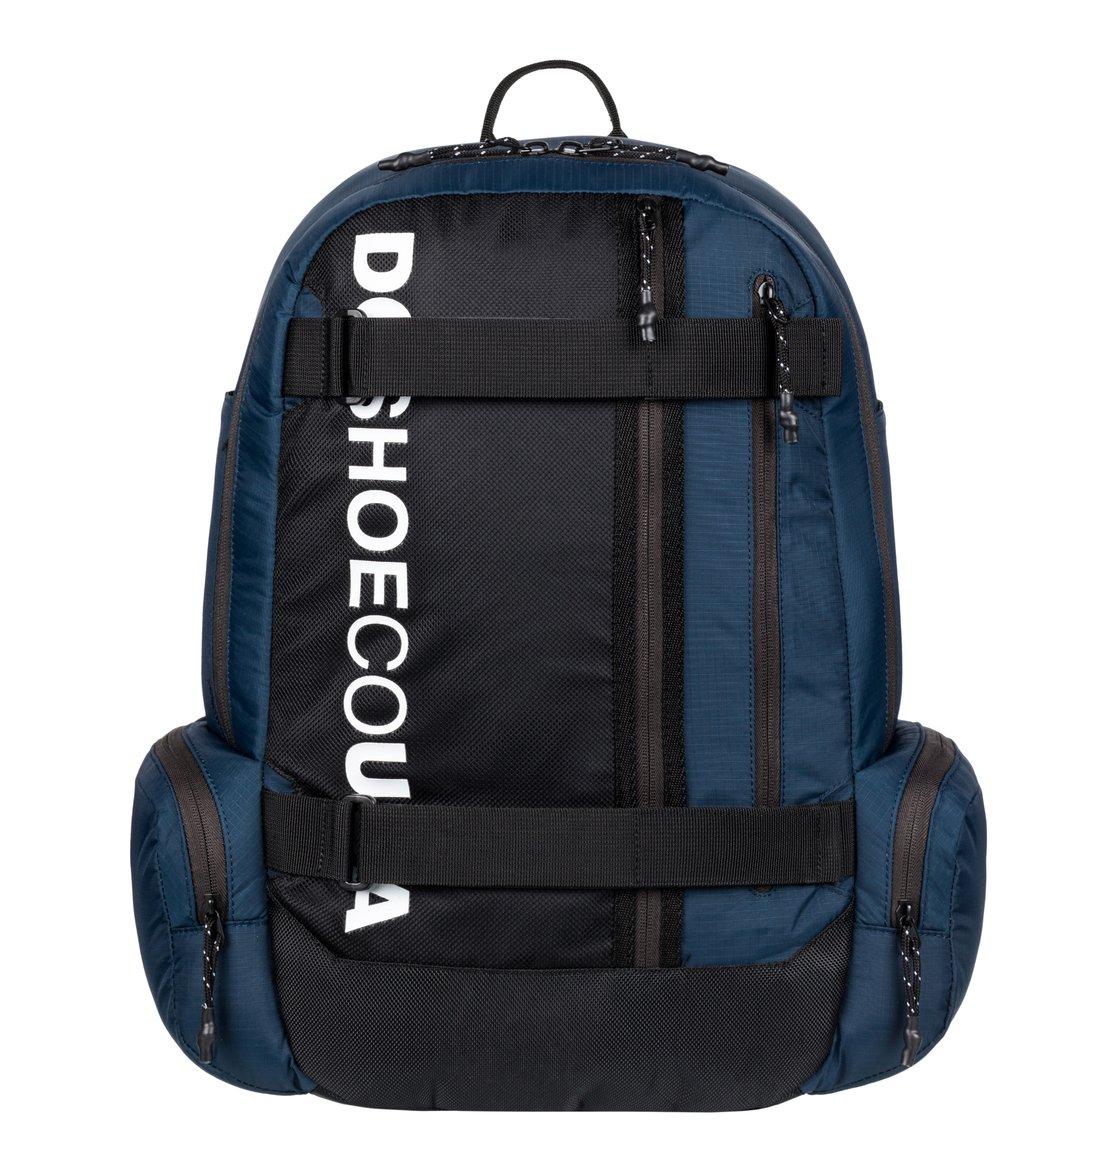 4a6e36d955 DC Shoes™ Bushings 23L - Medium Backpack - Men - ONE SIZE - Black